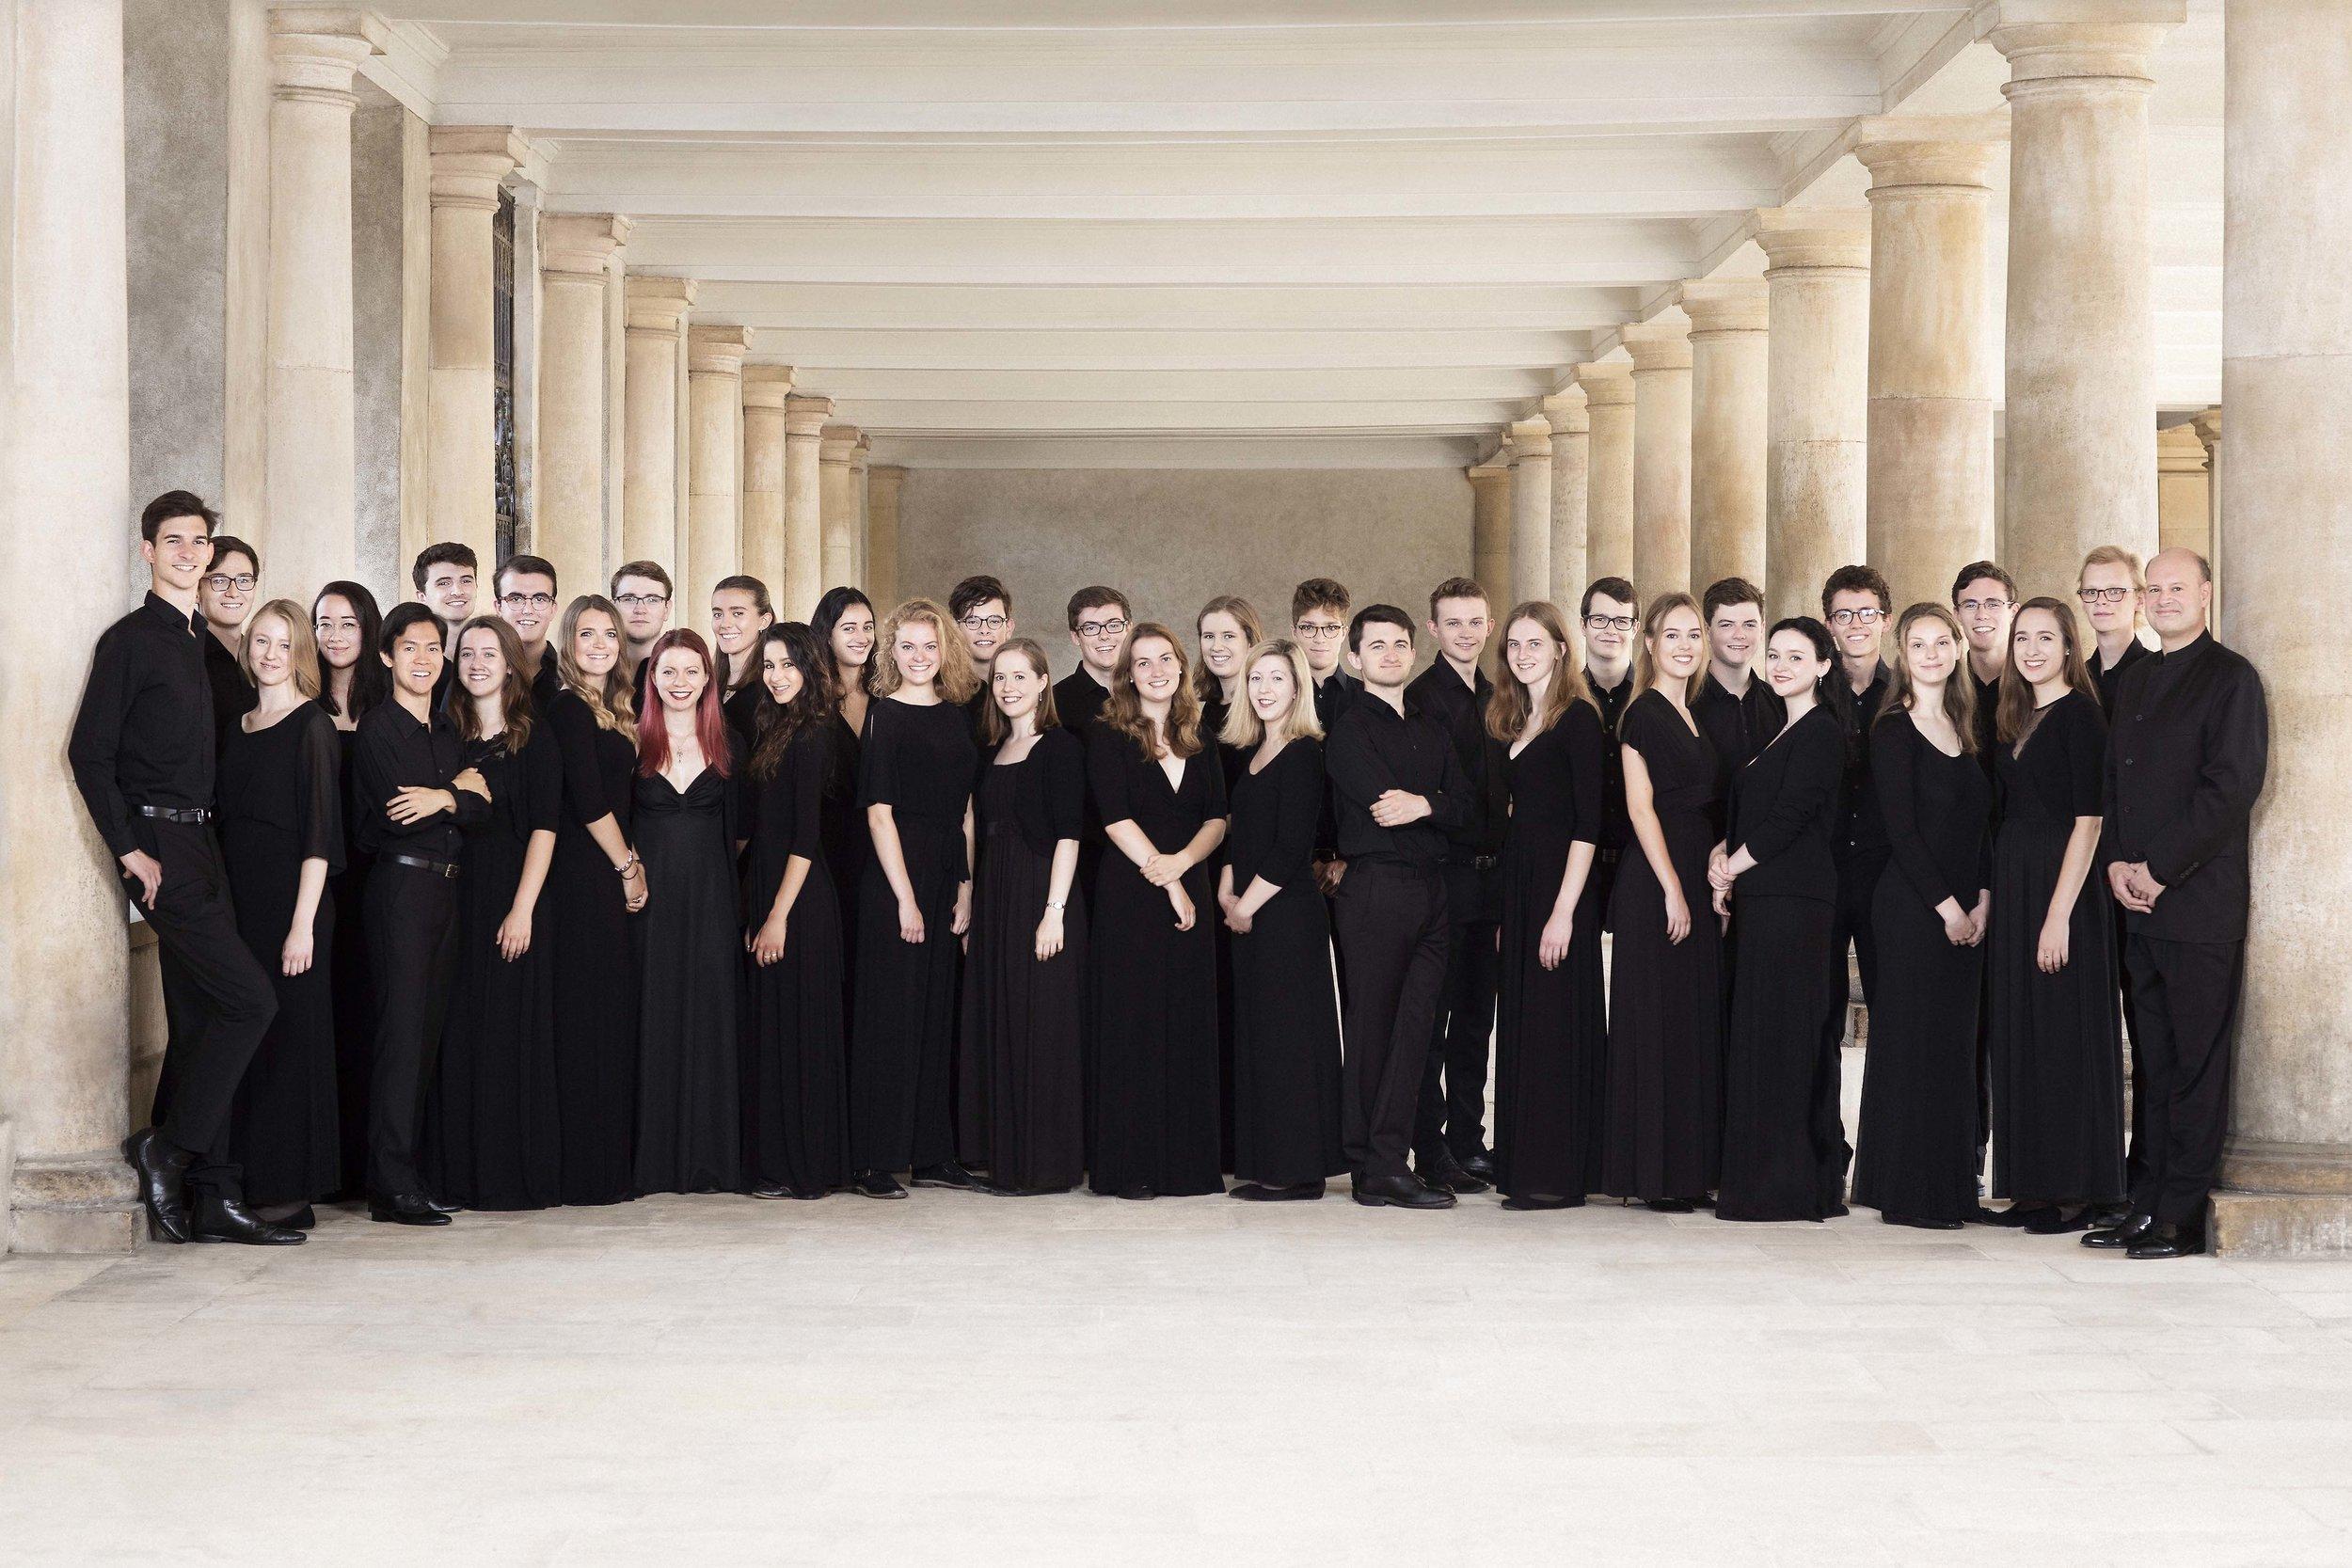 The_Choir_of_Trinity_College_Cambridge_credit_Benjamin_Ealovega-3.jpg